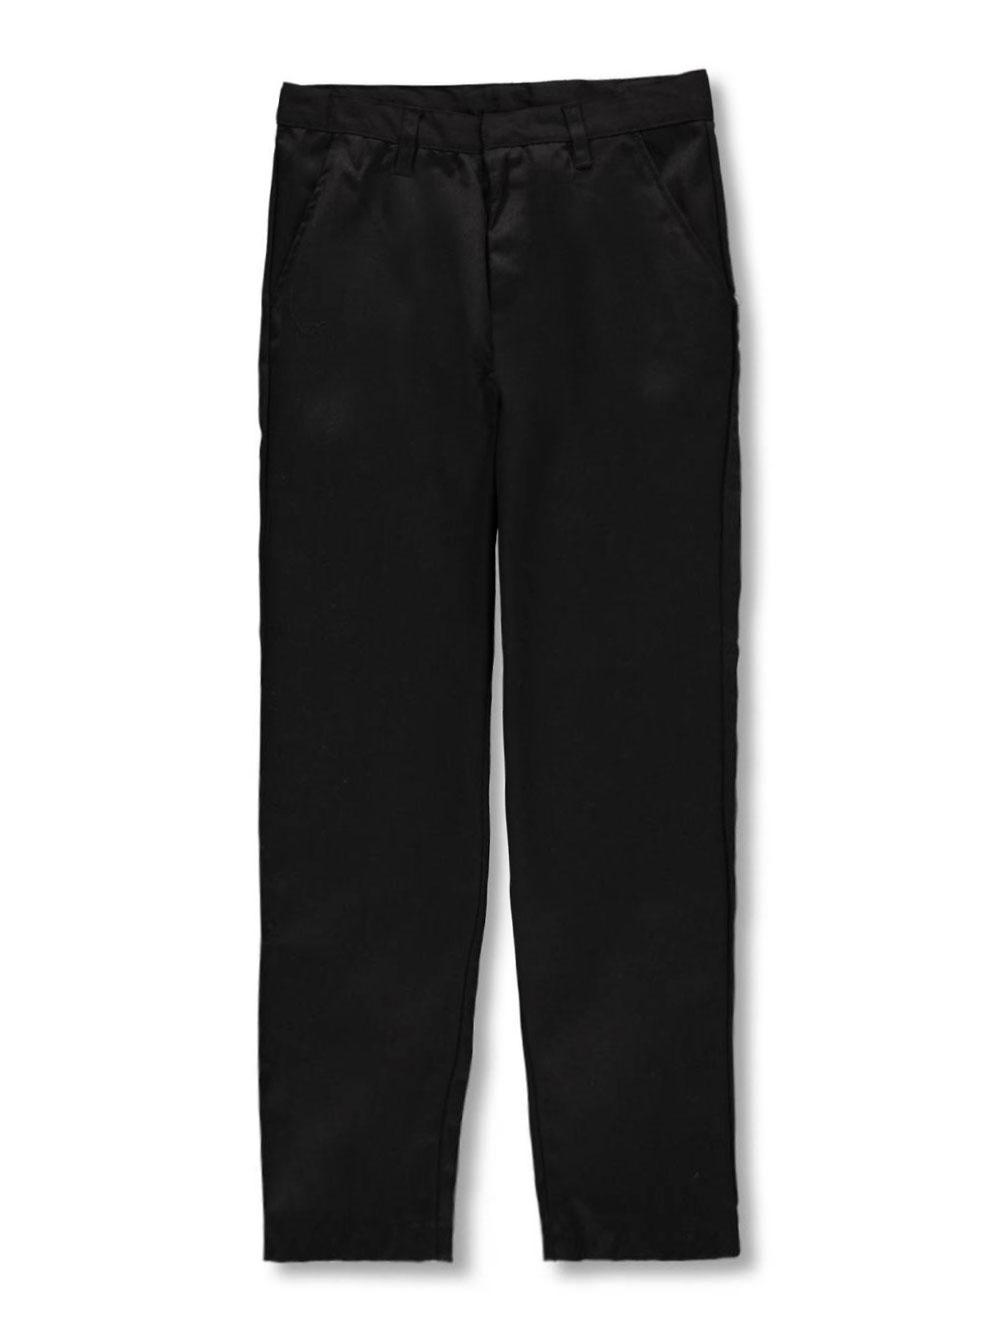 7ab1d66a8454f0 School Uniforms | Boys | Pants. Zoomed Image